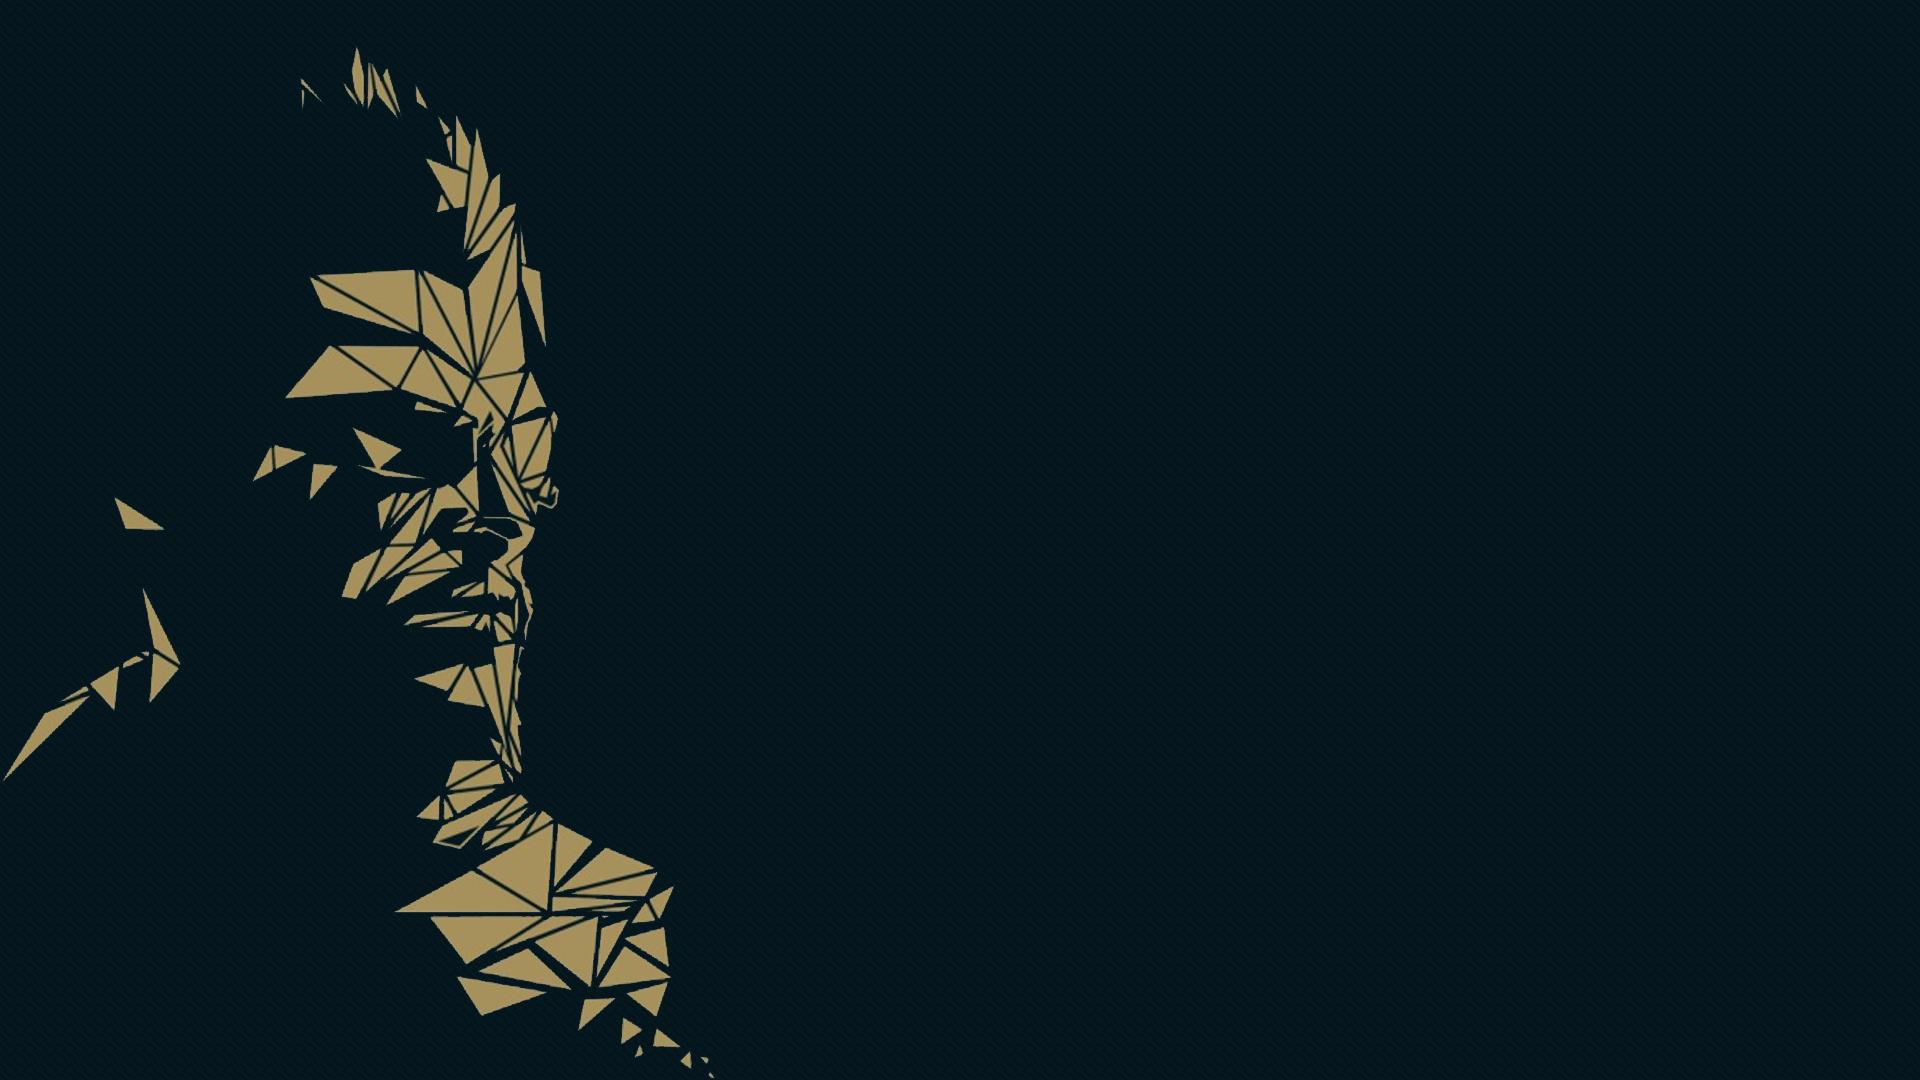 It May Not Be Perfect But Deus Ex Is Still A Blueprint For Gaming Freedom Deus Ex Deus Ex Human Glasses Wallpaper